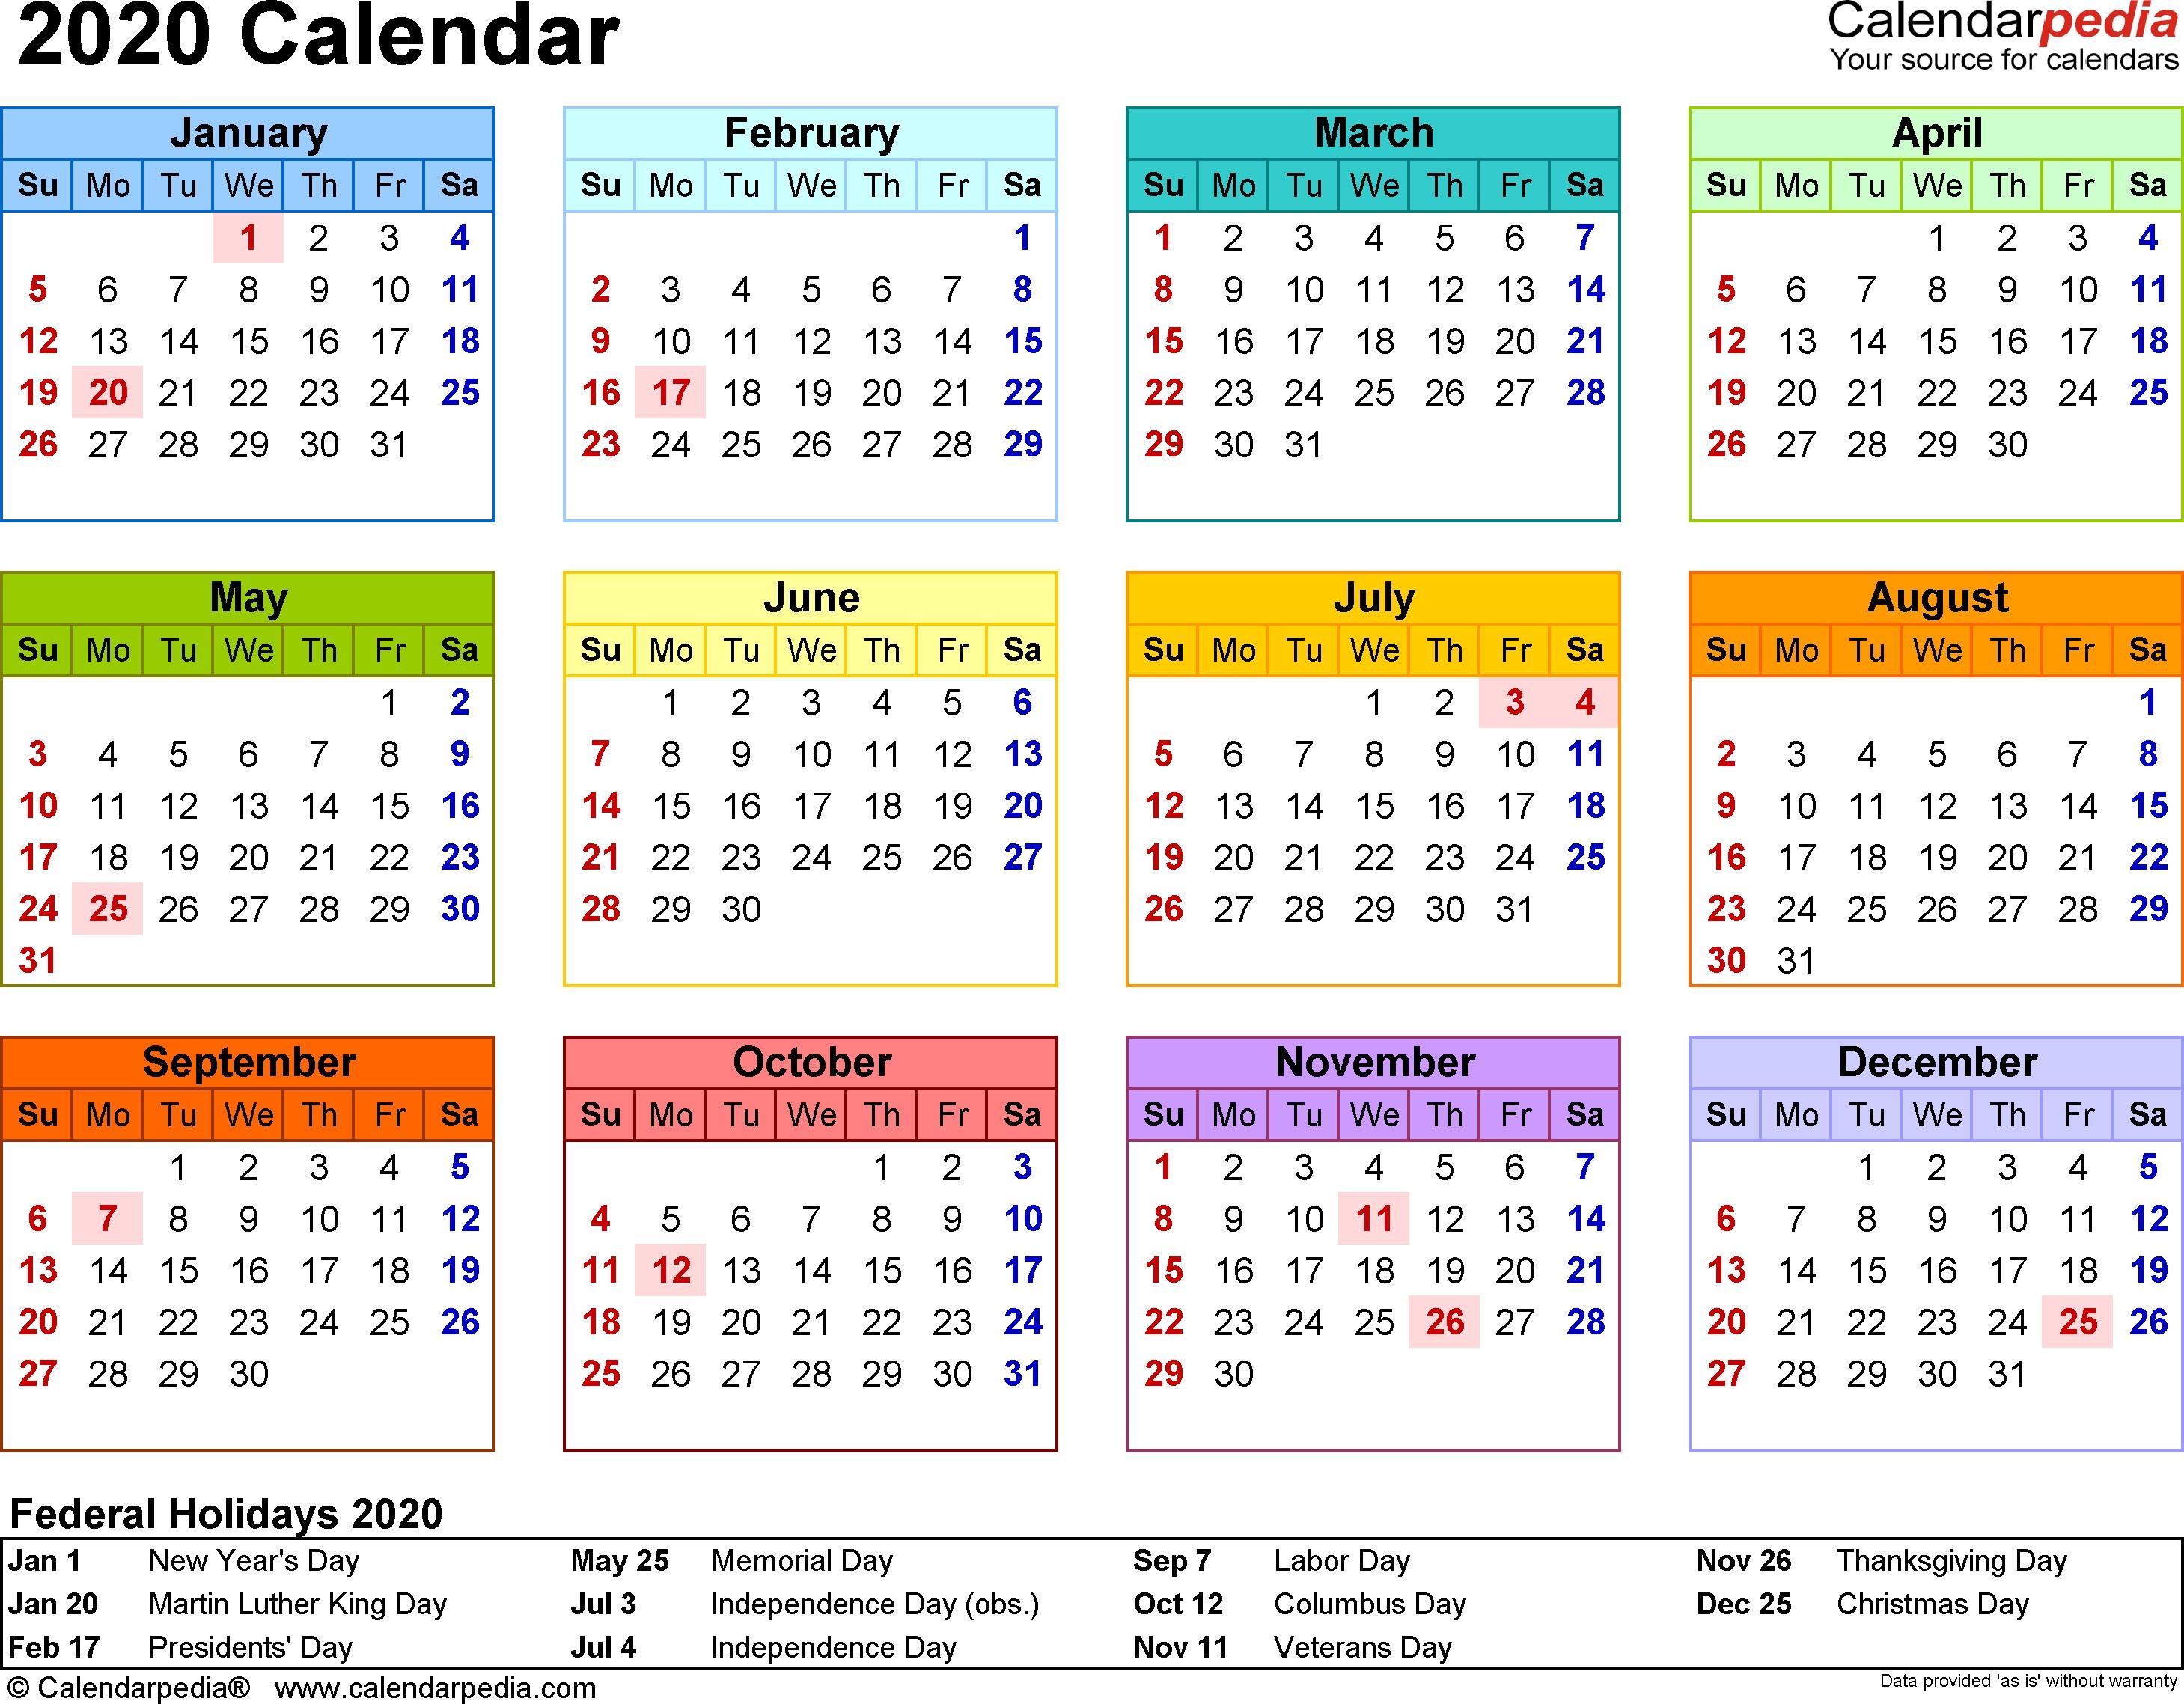 2020 Calendar - Download 18 Free Printable Excel Templates-2020 Calendar Hong Kong Public Holidays